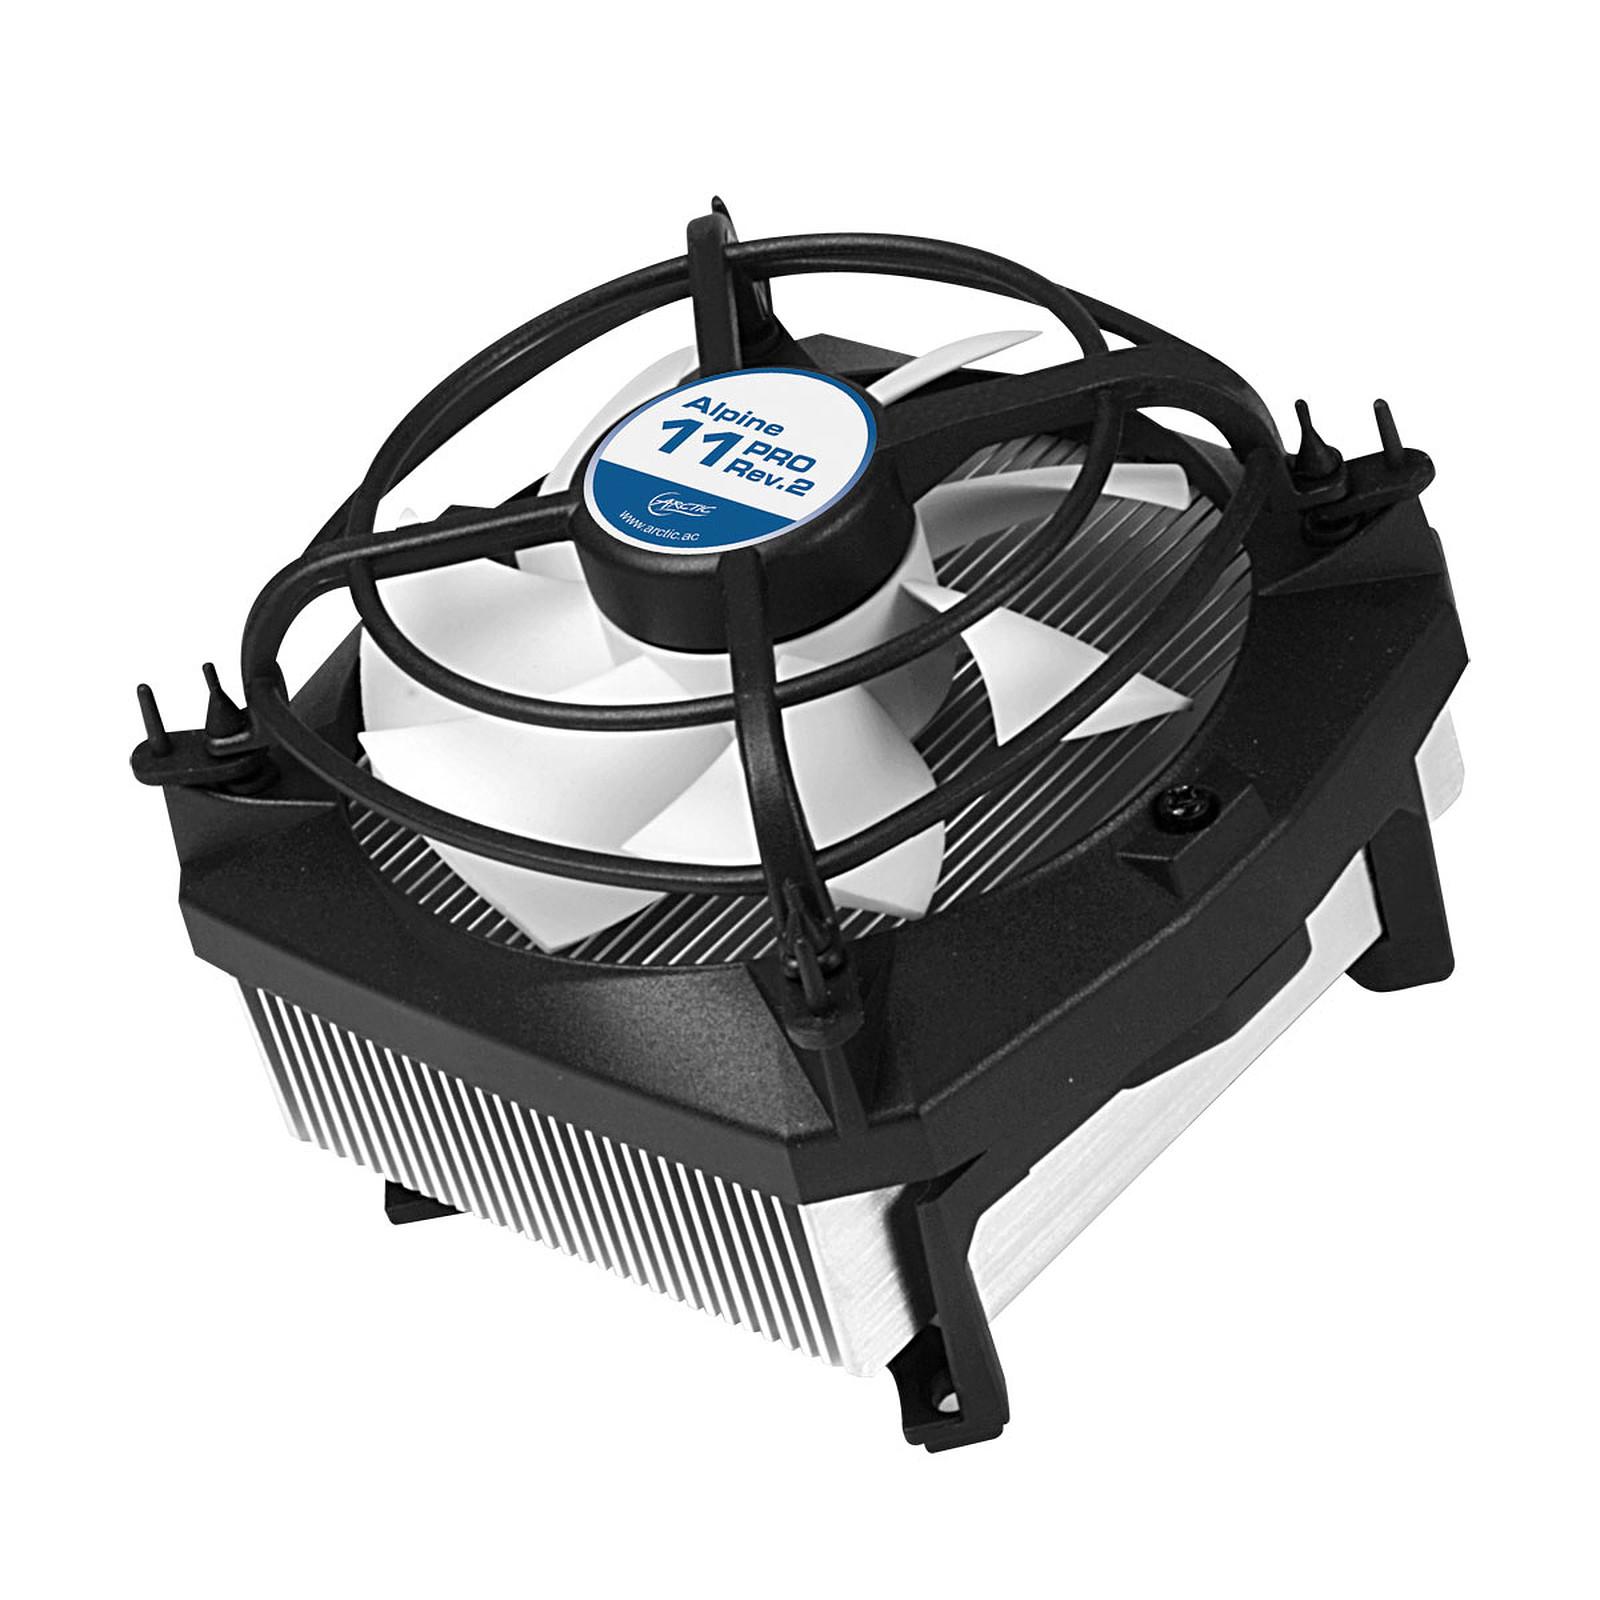 CPU COOLER COOLERMASTER X-DREAM I117